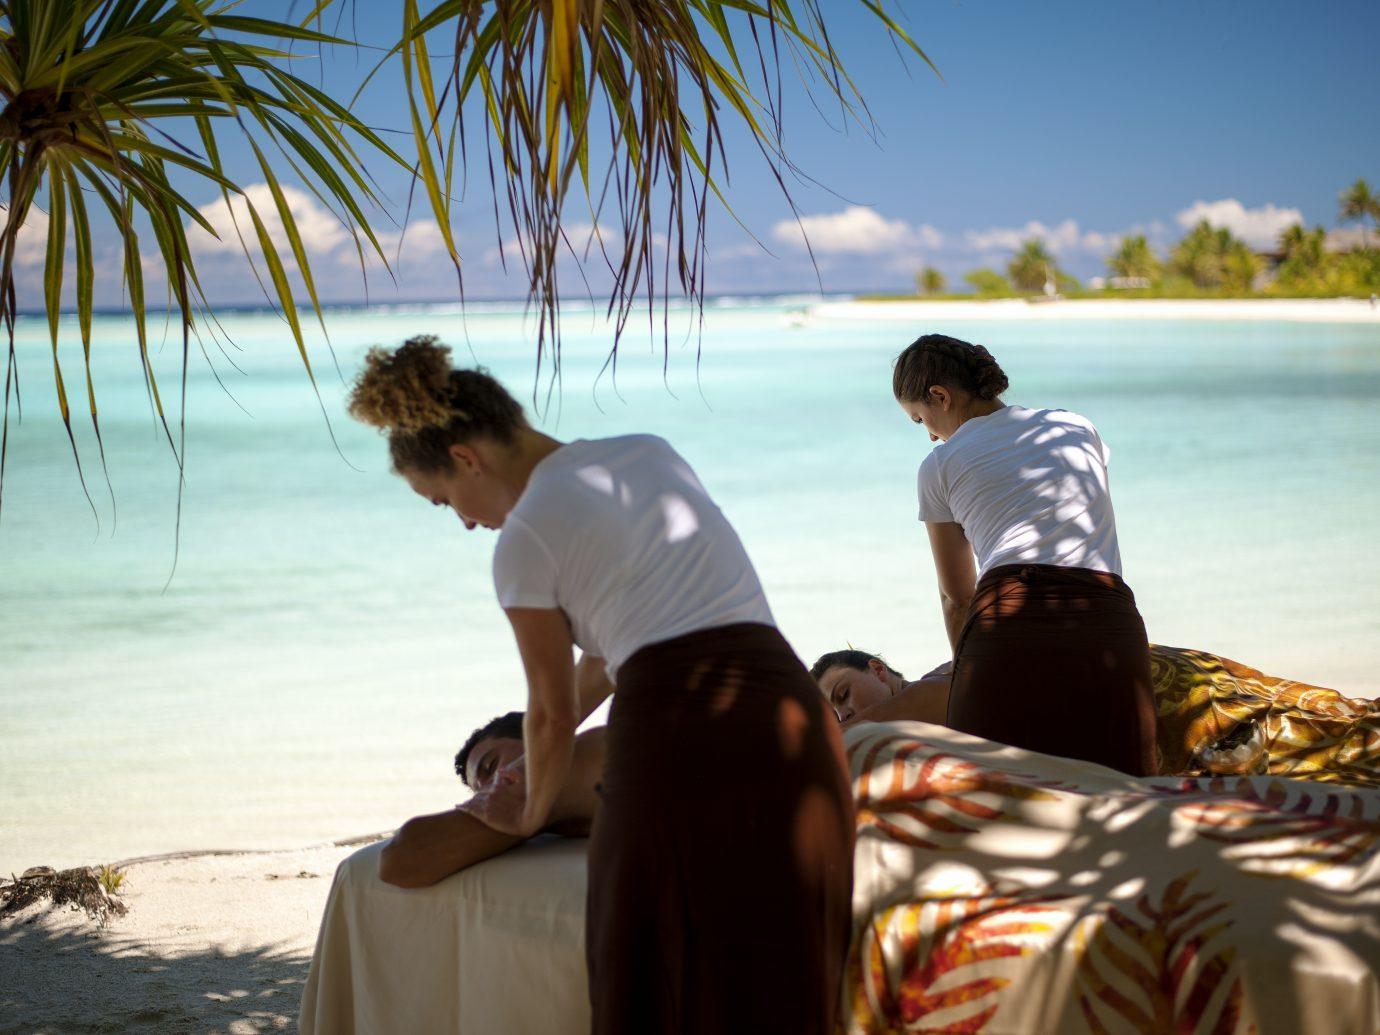 massage on the beach at The Brando, Tetiaroa, Tahiti